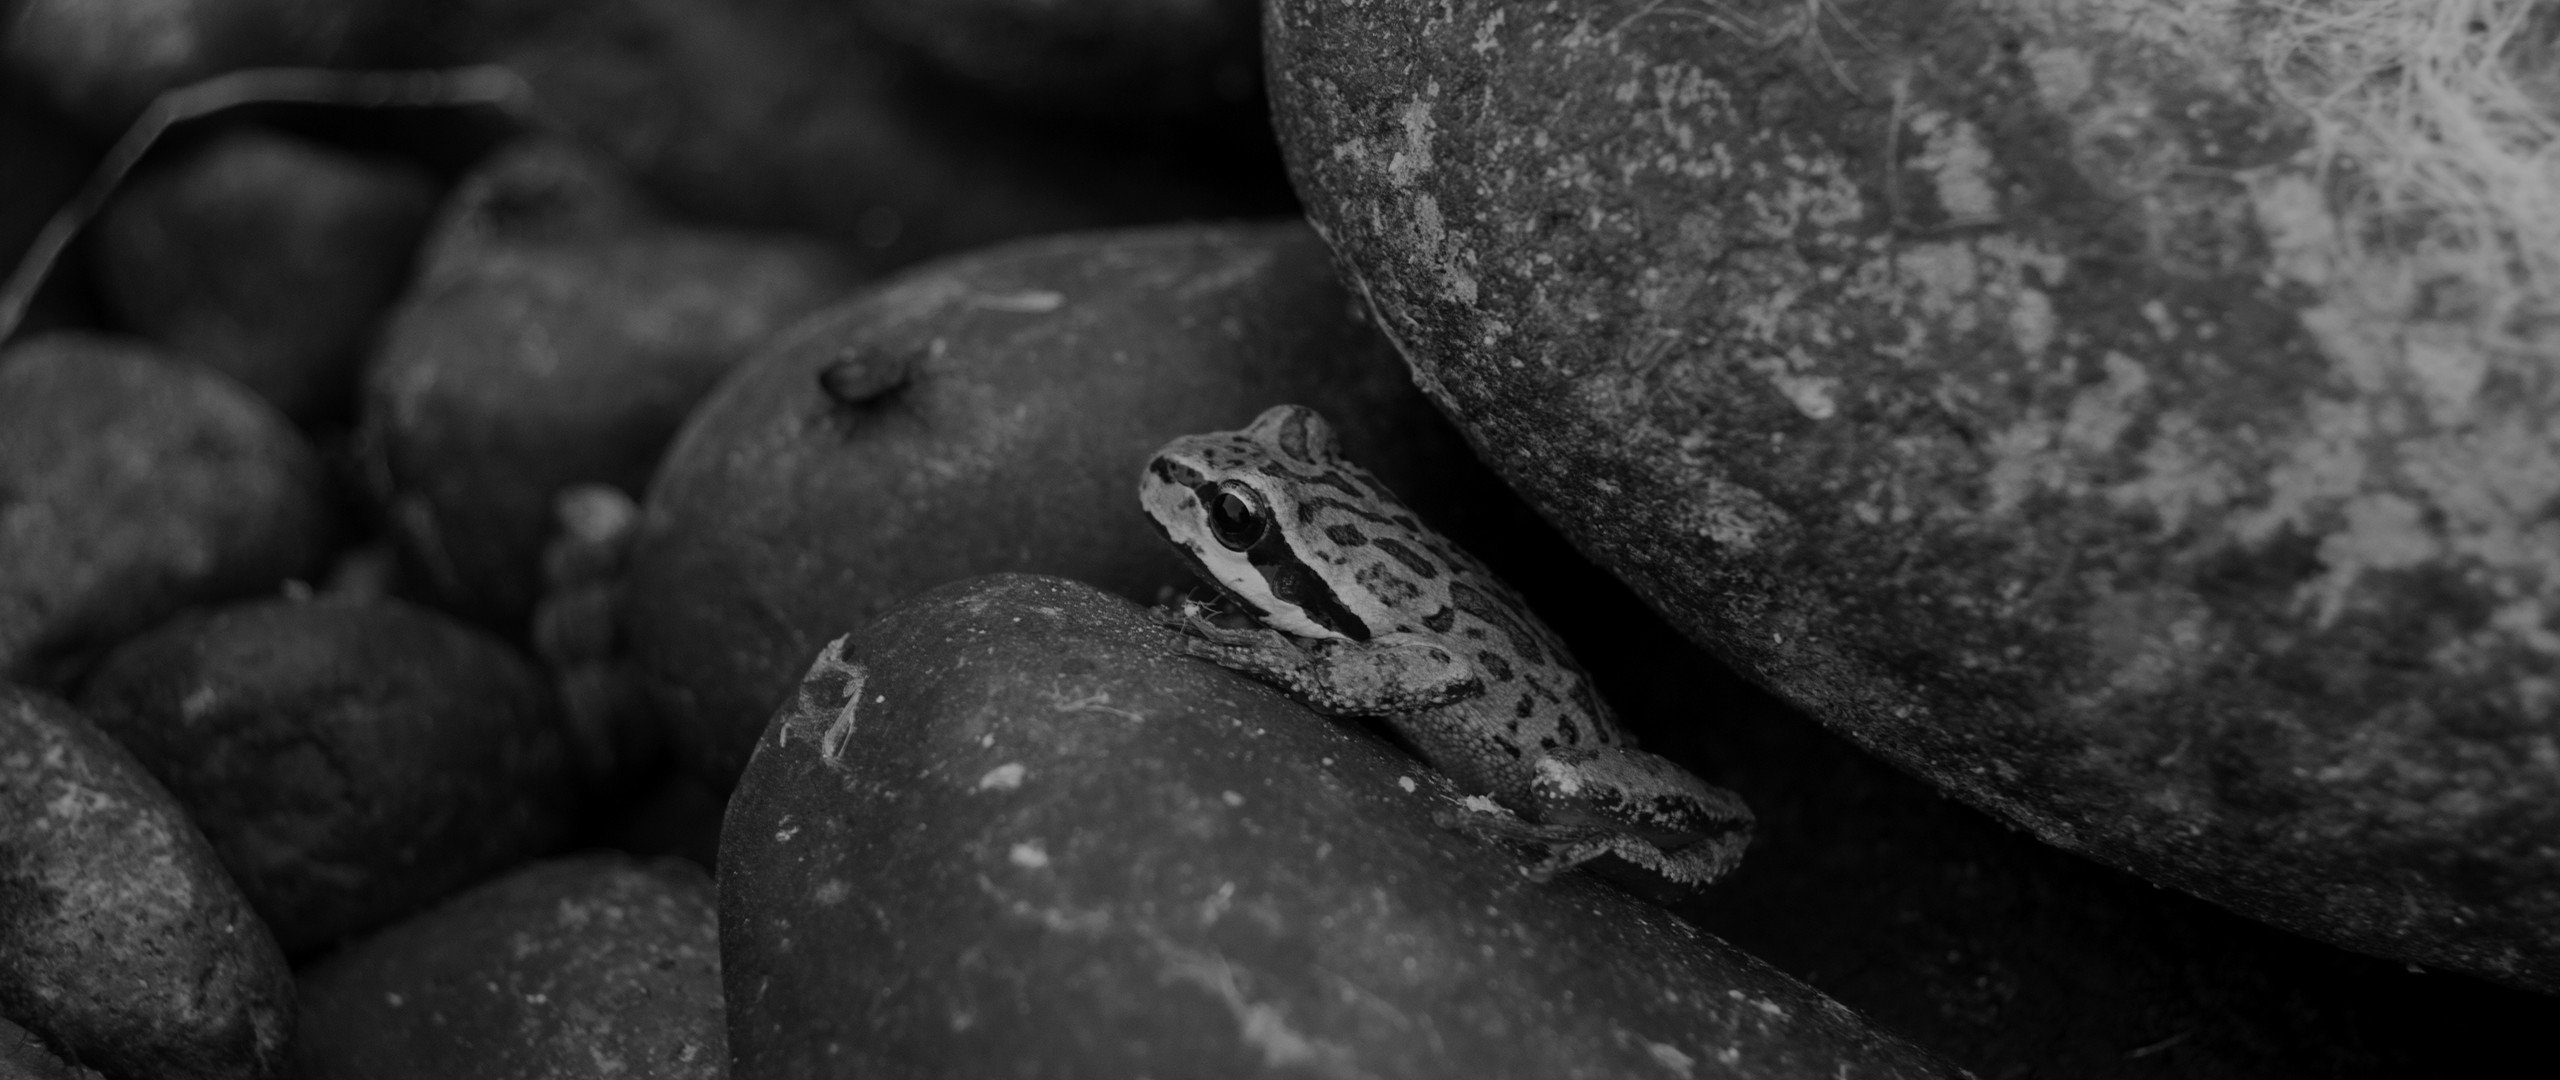 Res: 2560x1080, Froggy via Classy Bro